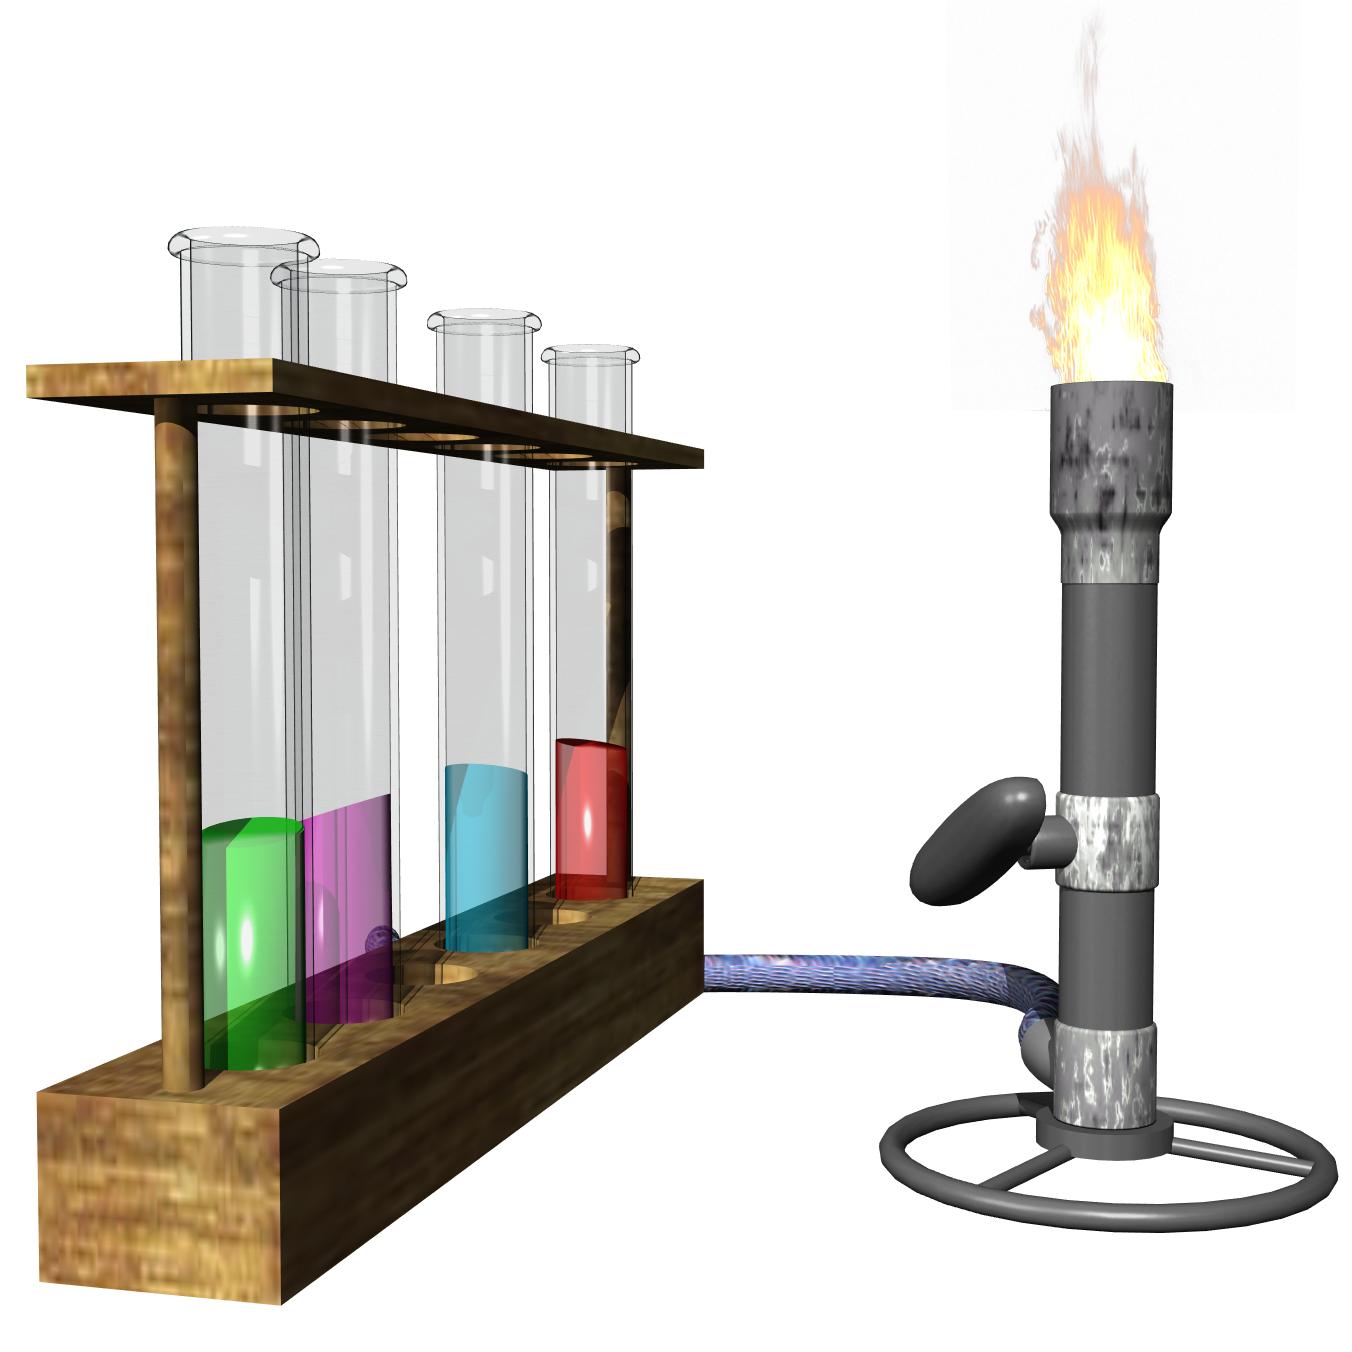 Iron stand laboratory apparatus. Lab clipart lab supply